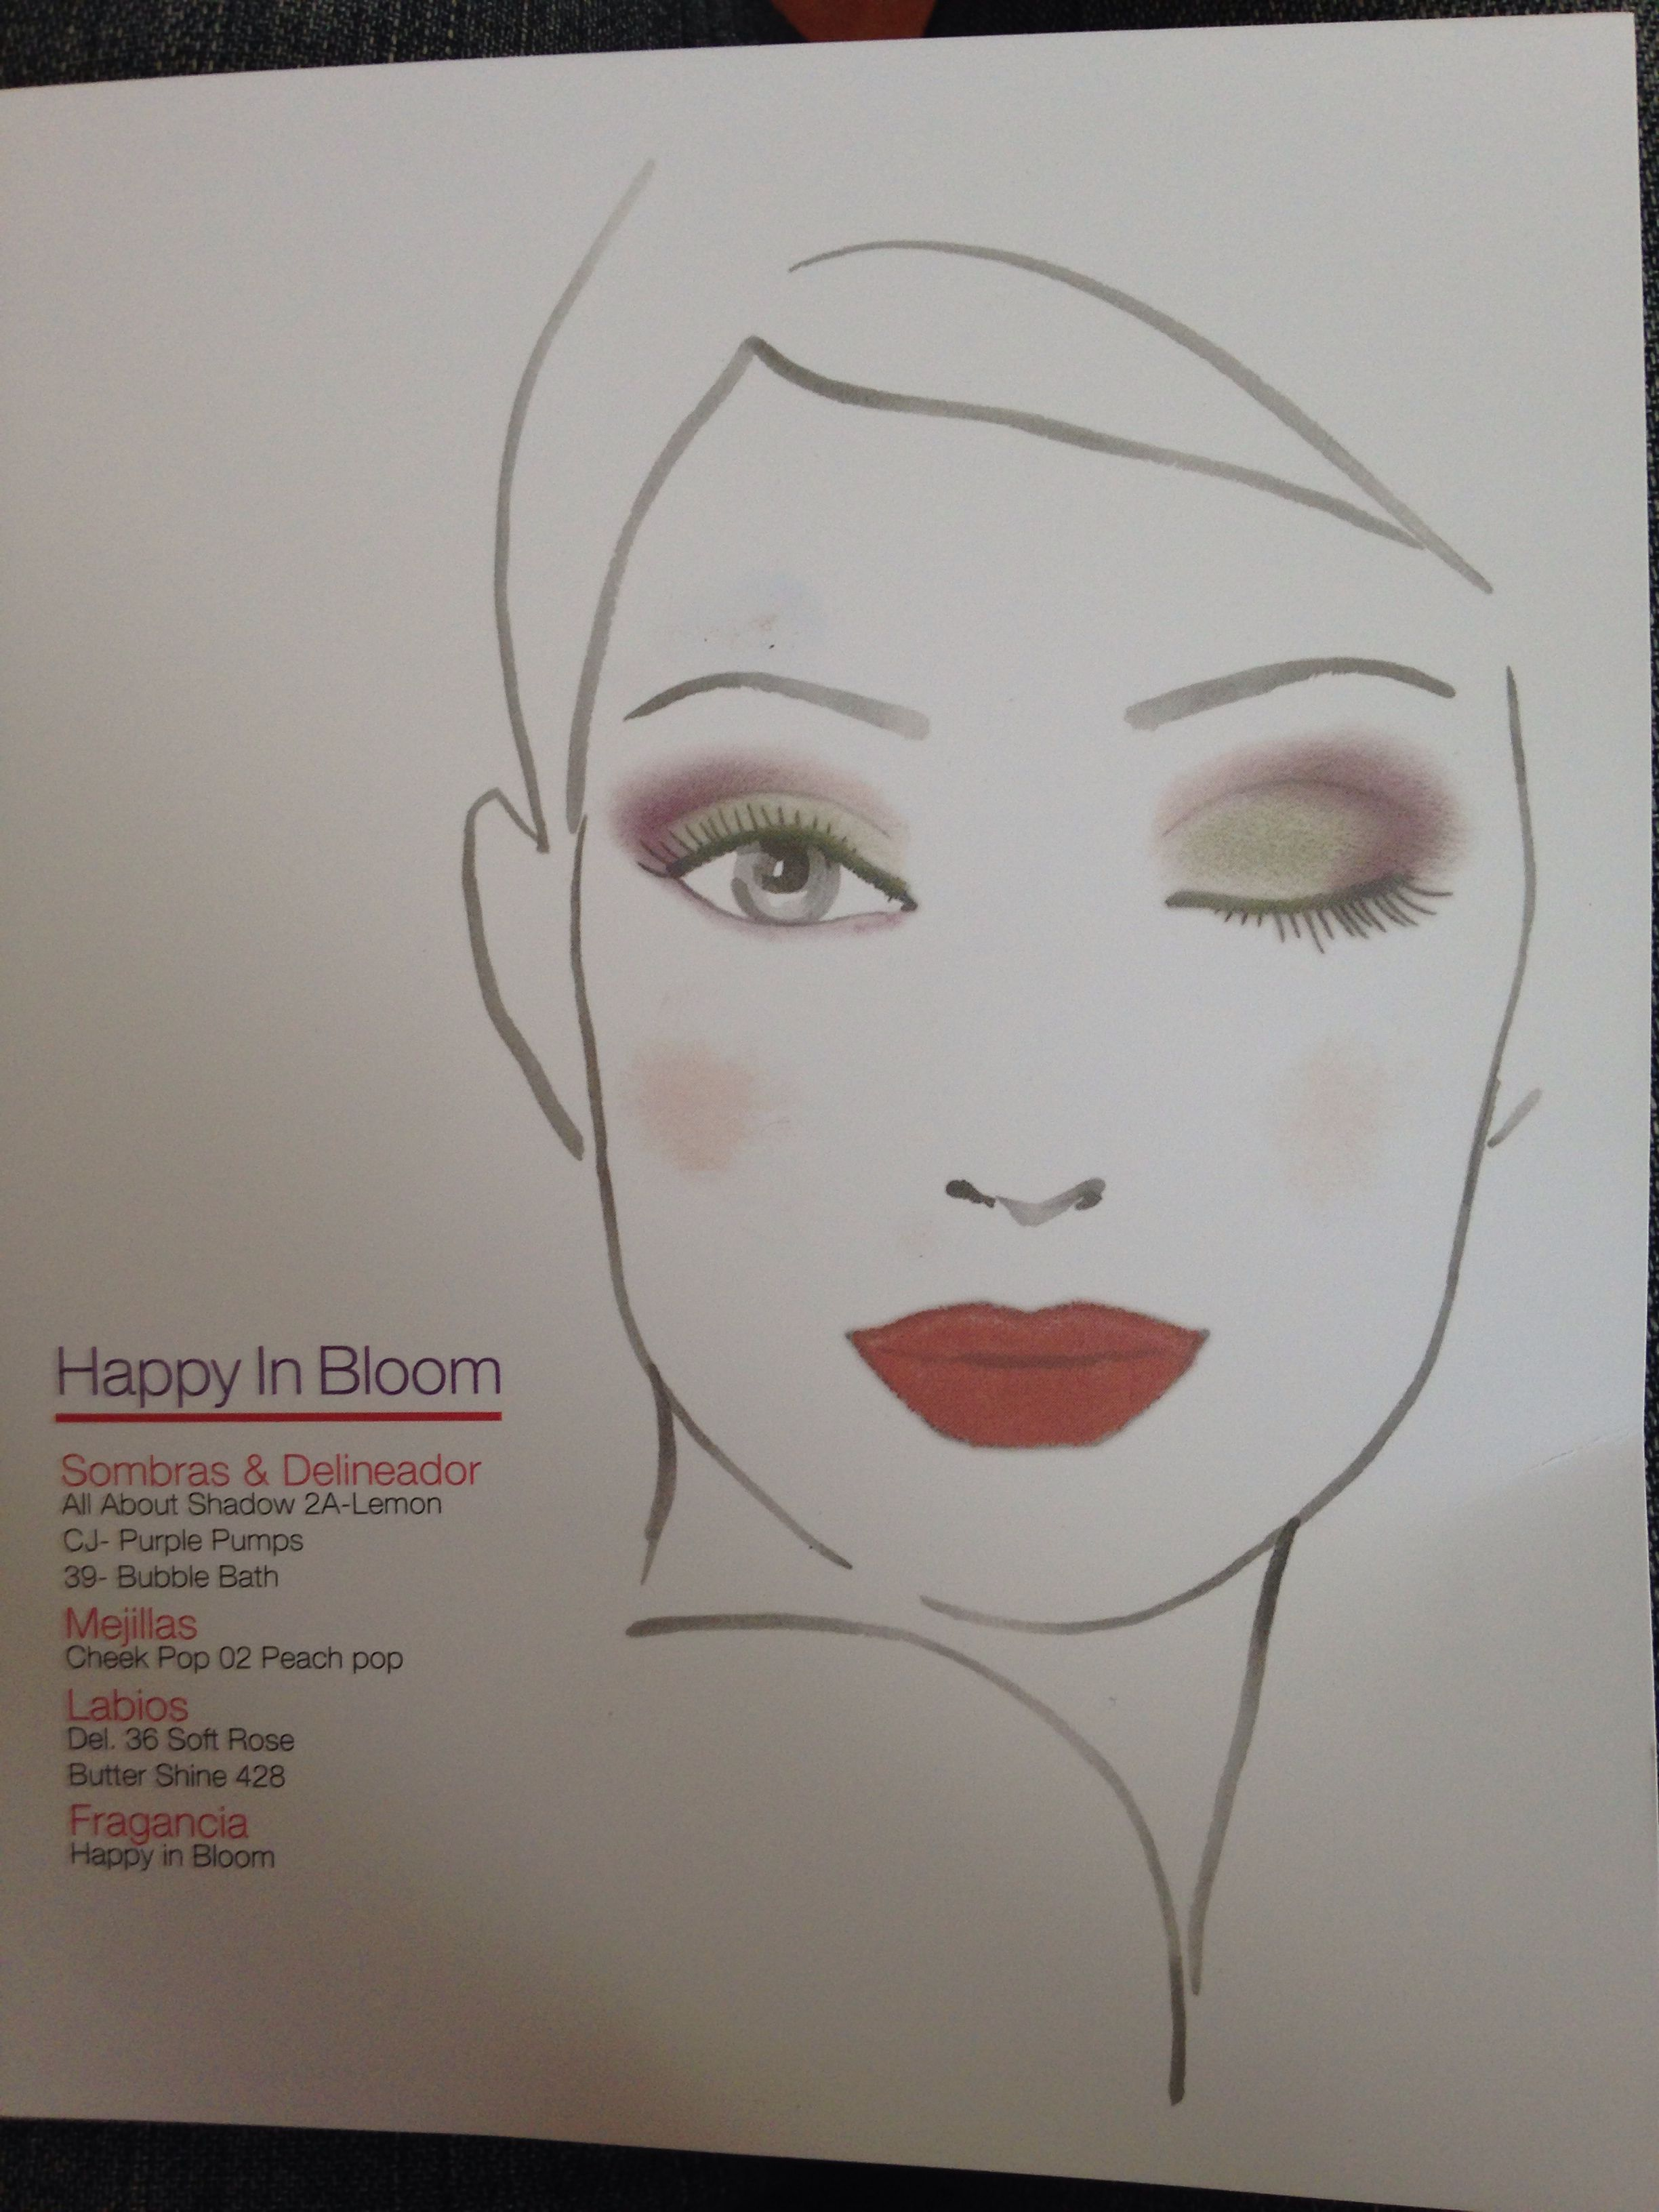 Happy in Bloom